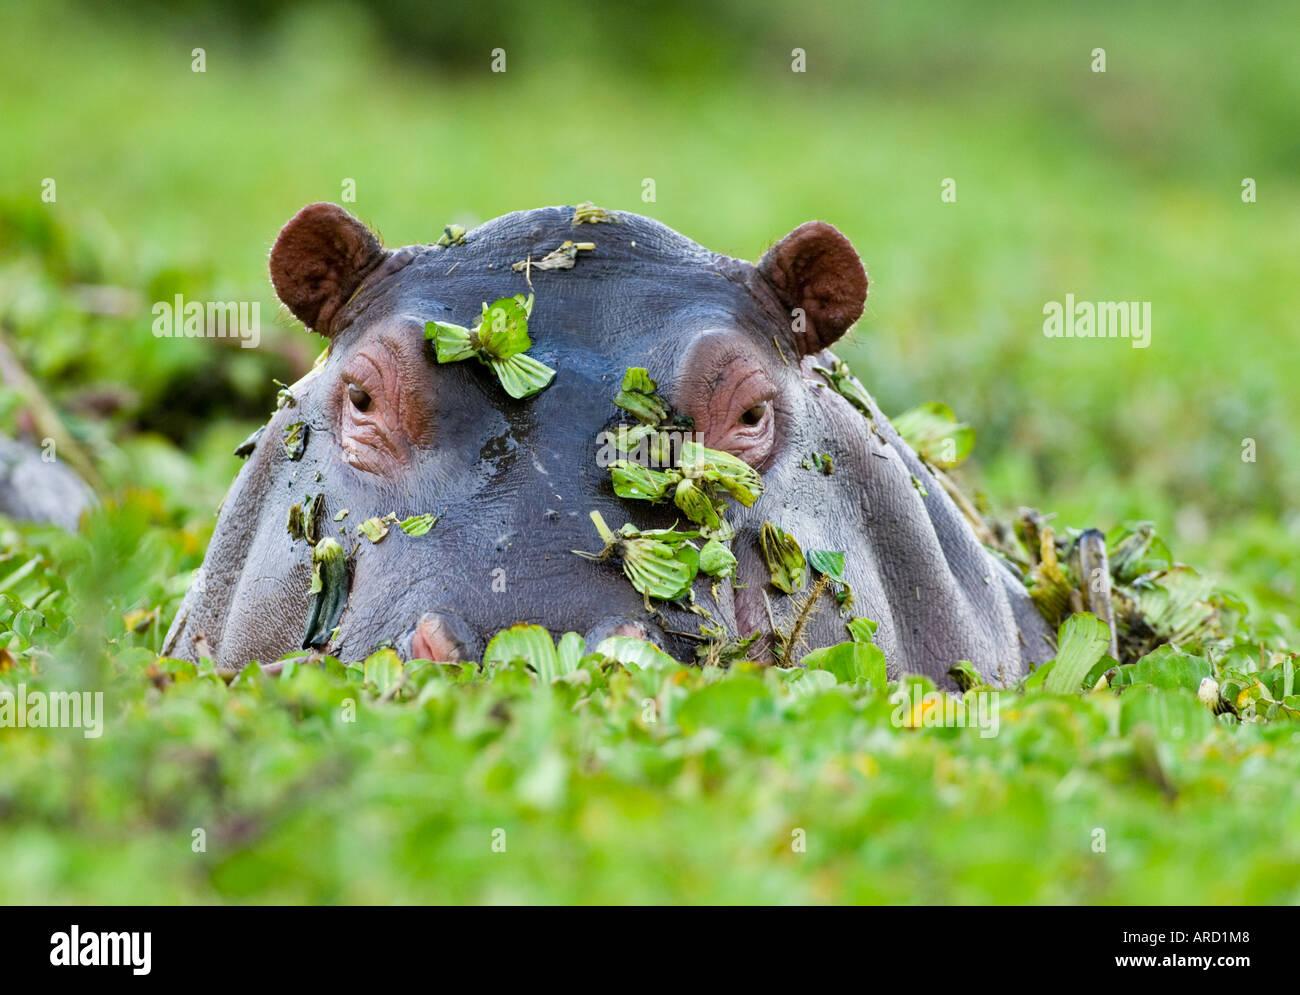 Hipopótamos que emergen de la piscina cubierta de maleza Masai Mara Kenya Imagen De Stock